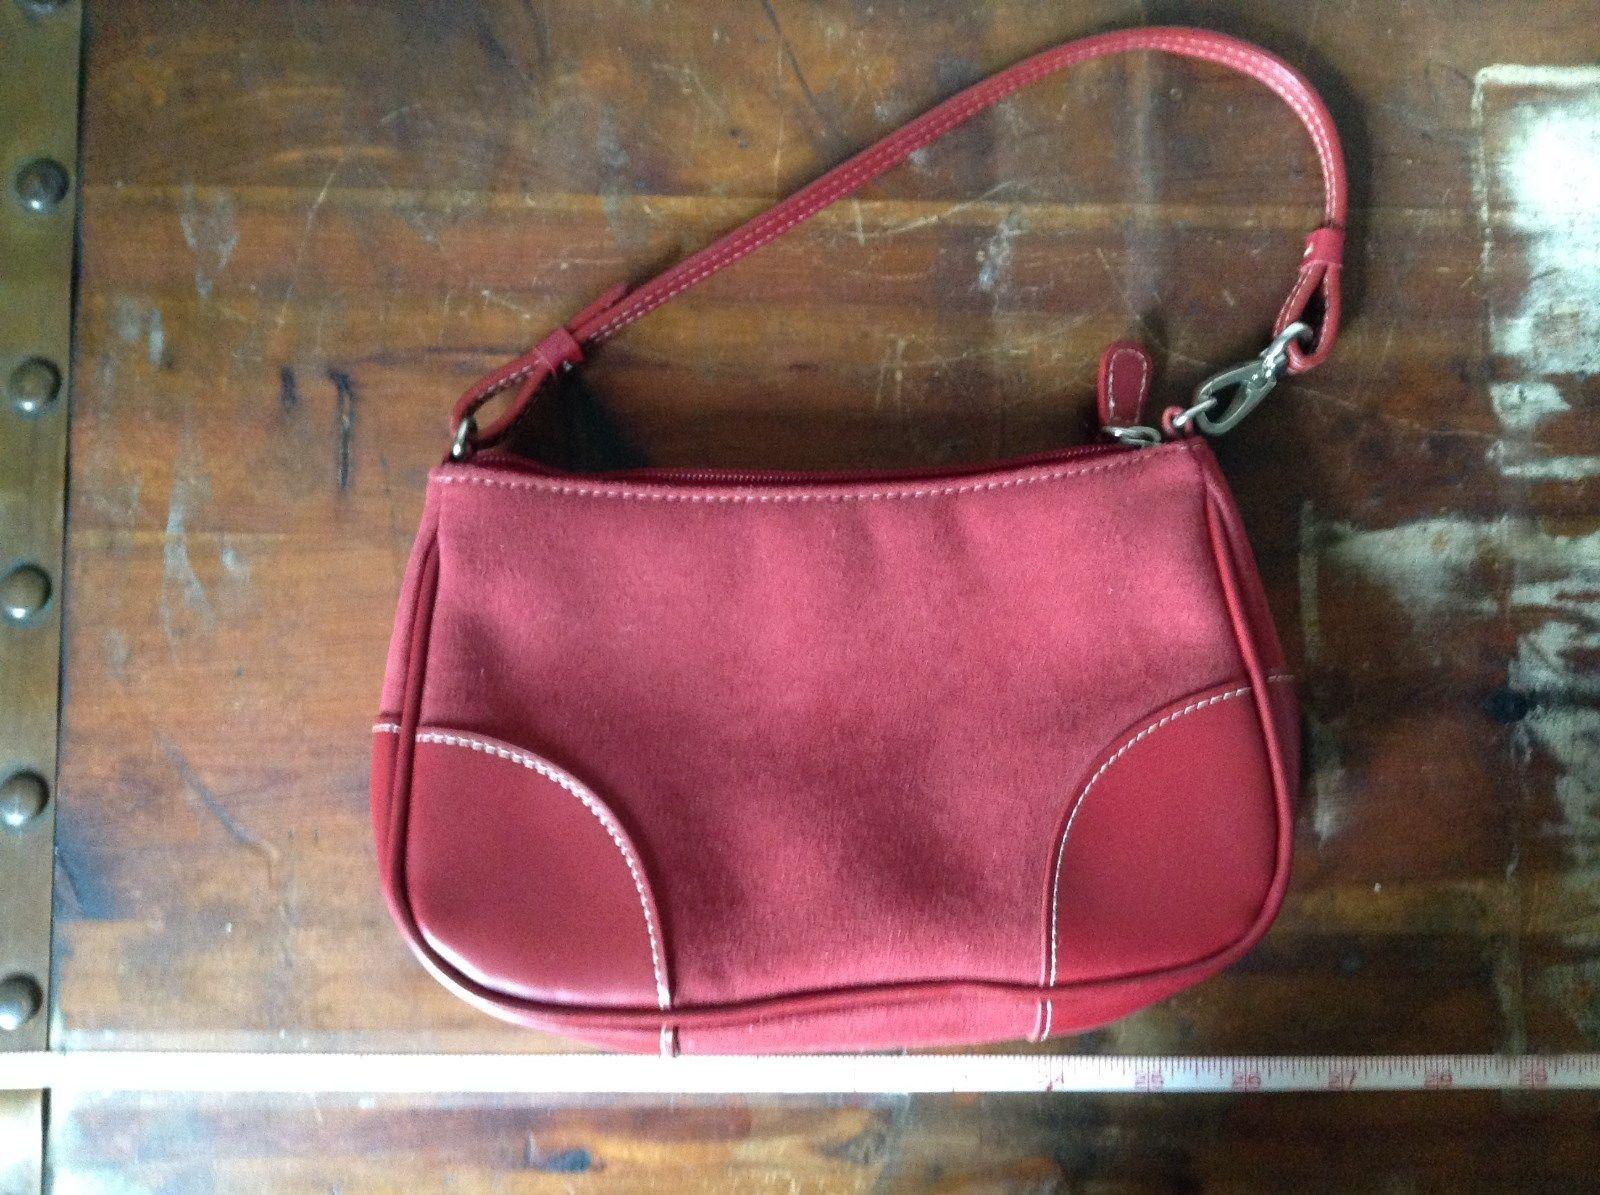 Cute Little Red Purse Handbag by Aeropostale